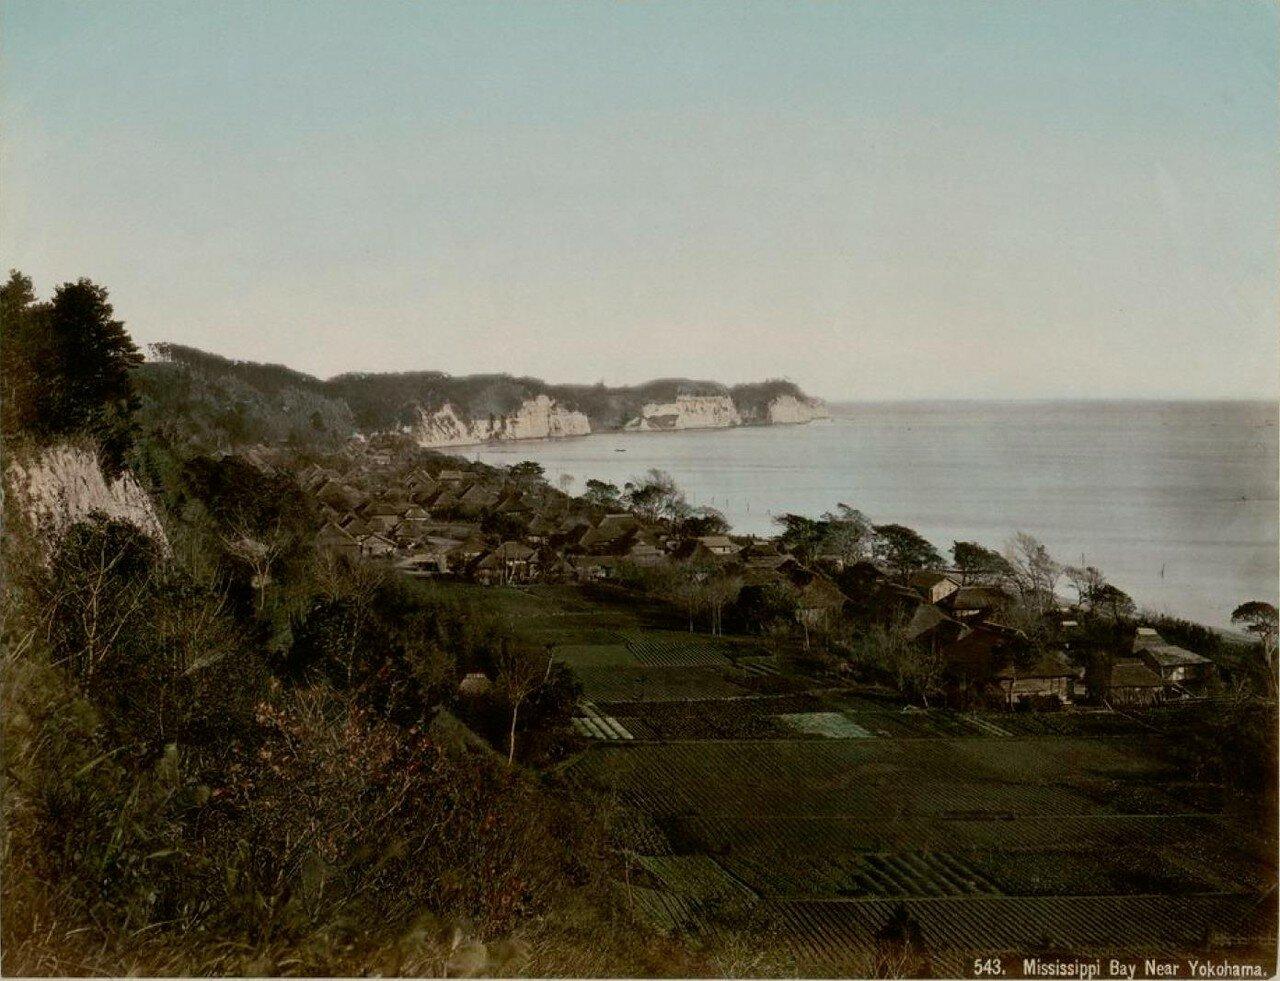 Иокогама. Залив Миссиссиппи